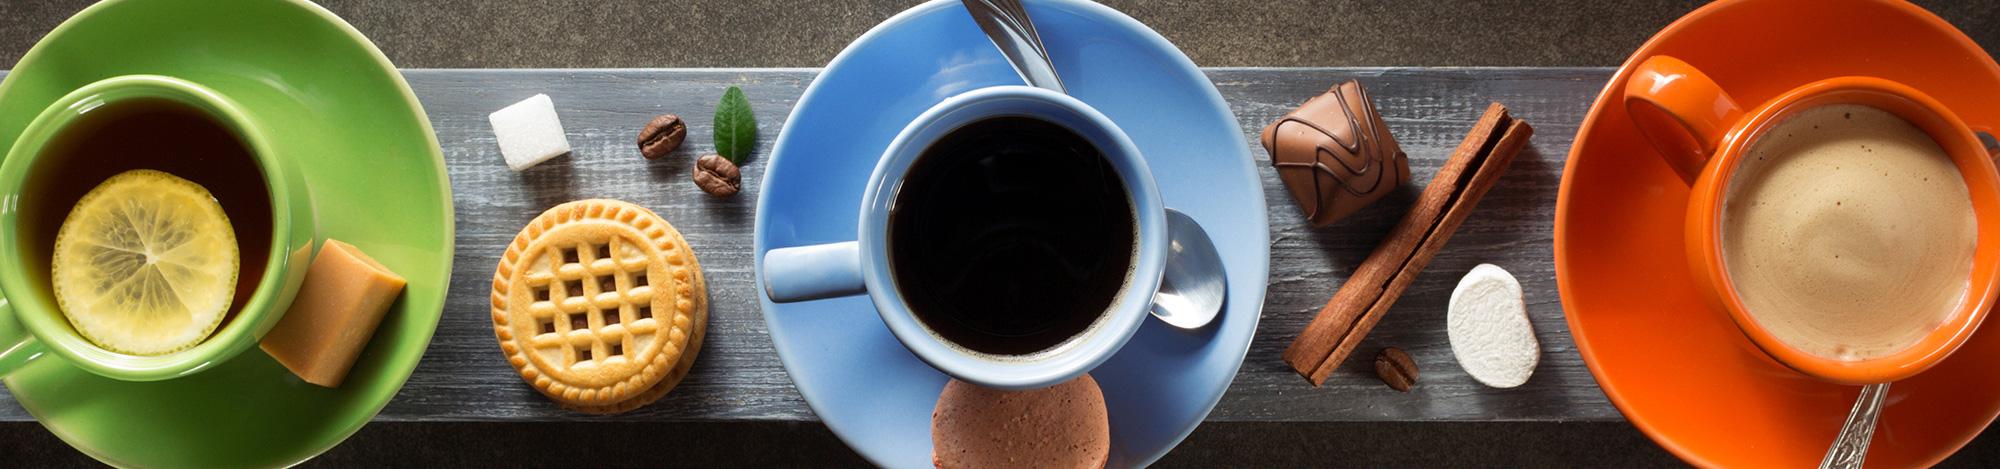 Cafés, Chás e Achocolatados